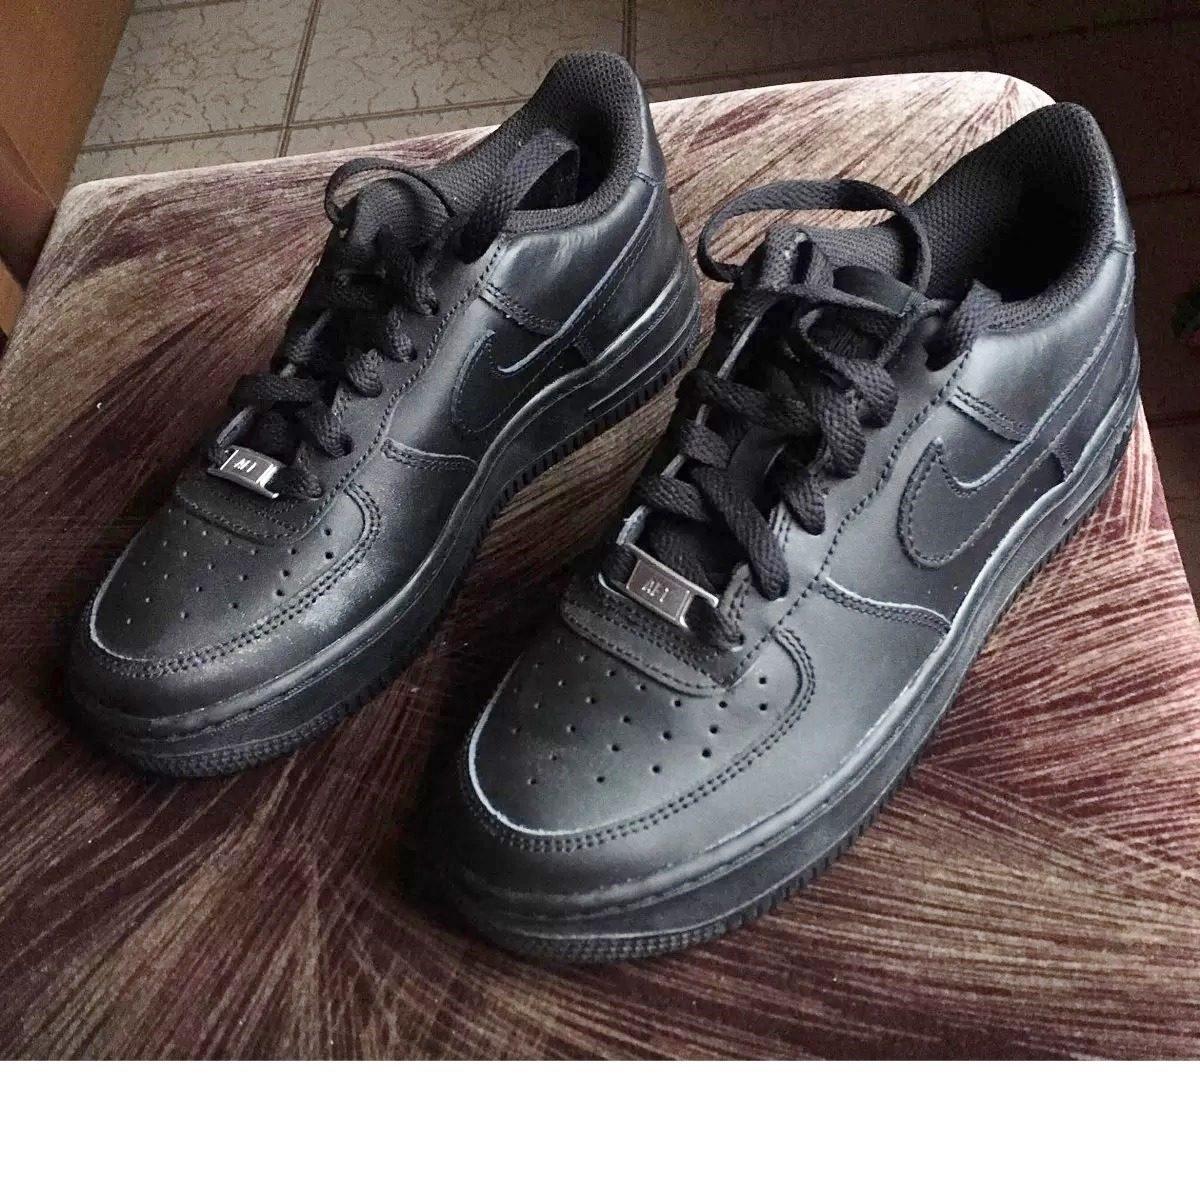 official photos 3fd14 ca293 Zapatillas Nike Air Force Low 1 - Niños - Negras - 23,5cm -